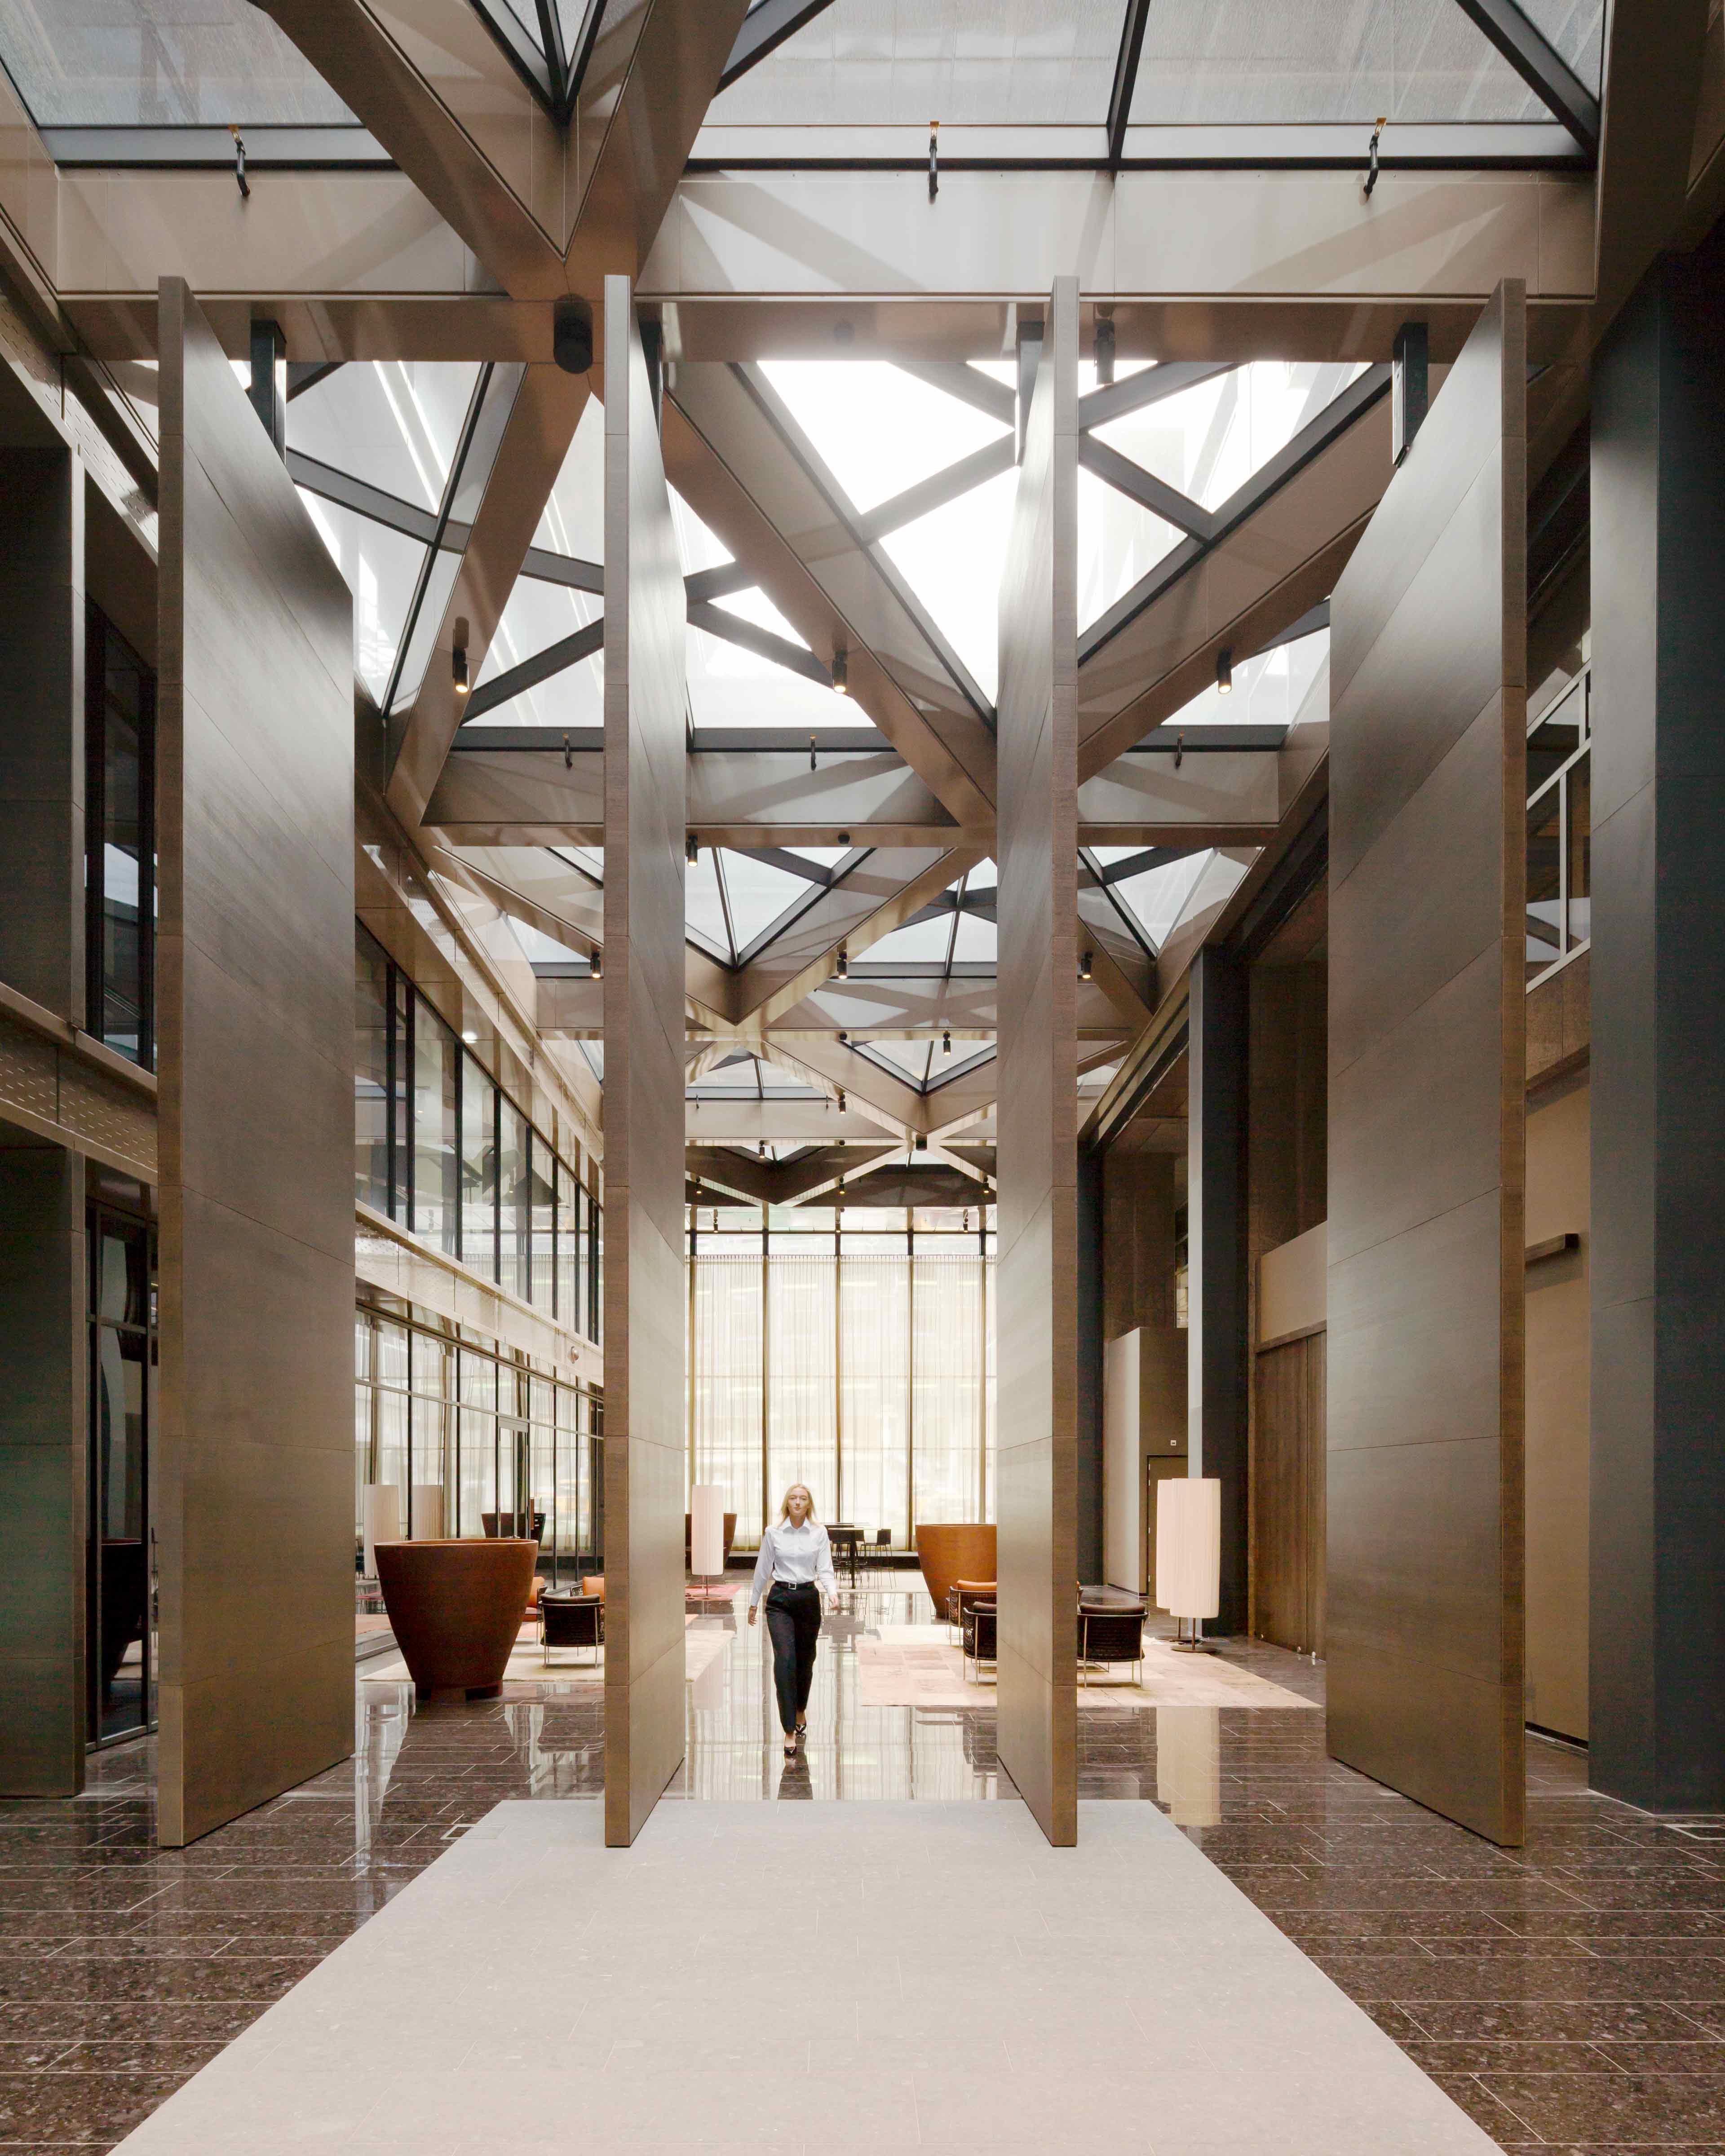 Seven meters tall and 500 kg each – massive pivot doors in the Atrium in Amsterdam. Design by MVSA Architecten, built by Harryvan Interieurbouw. FritsJurgens System 3 pivot hinge.